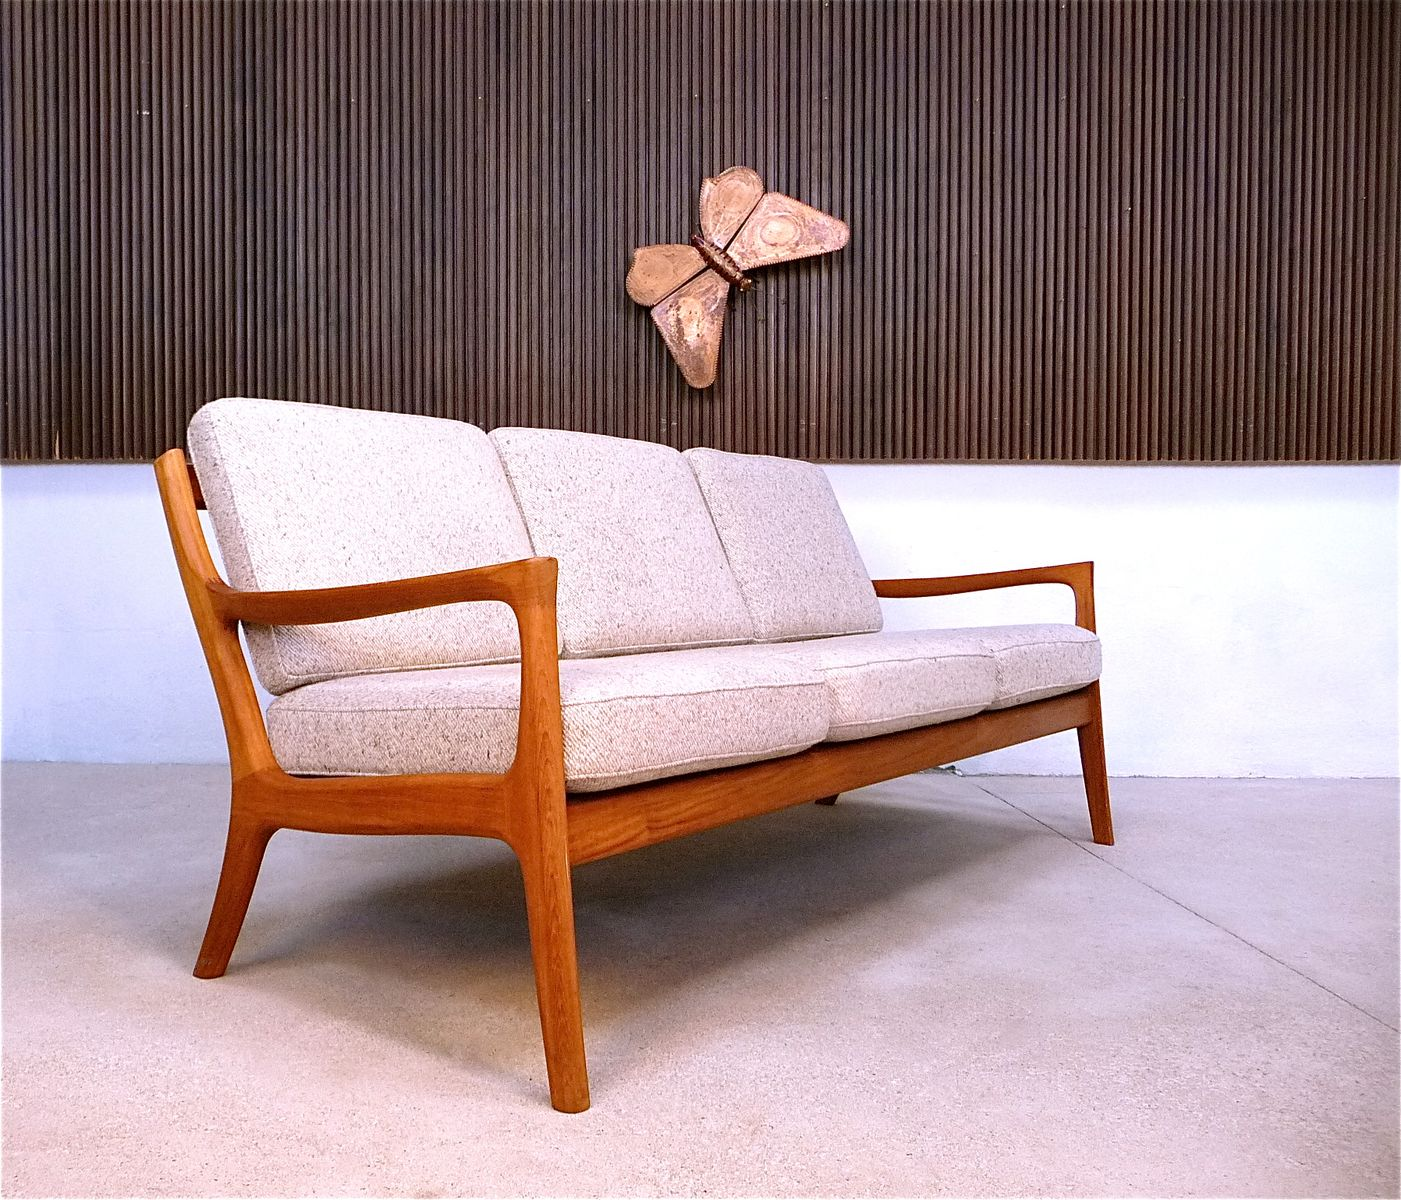 Sofá 3 Lugares Master Sofás Classic Em Velvet: Das Kunterbunte Sofa. Was Kann Ich Hinter Das Sofa Stellen